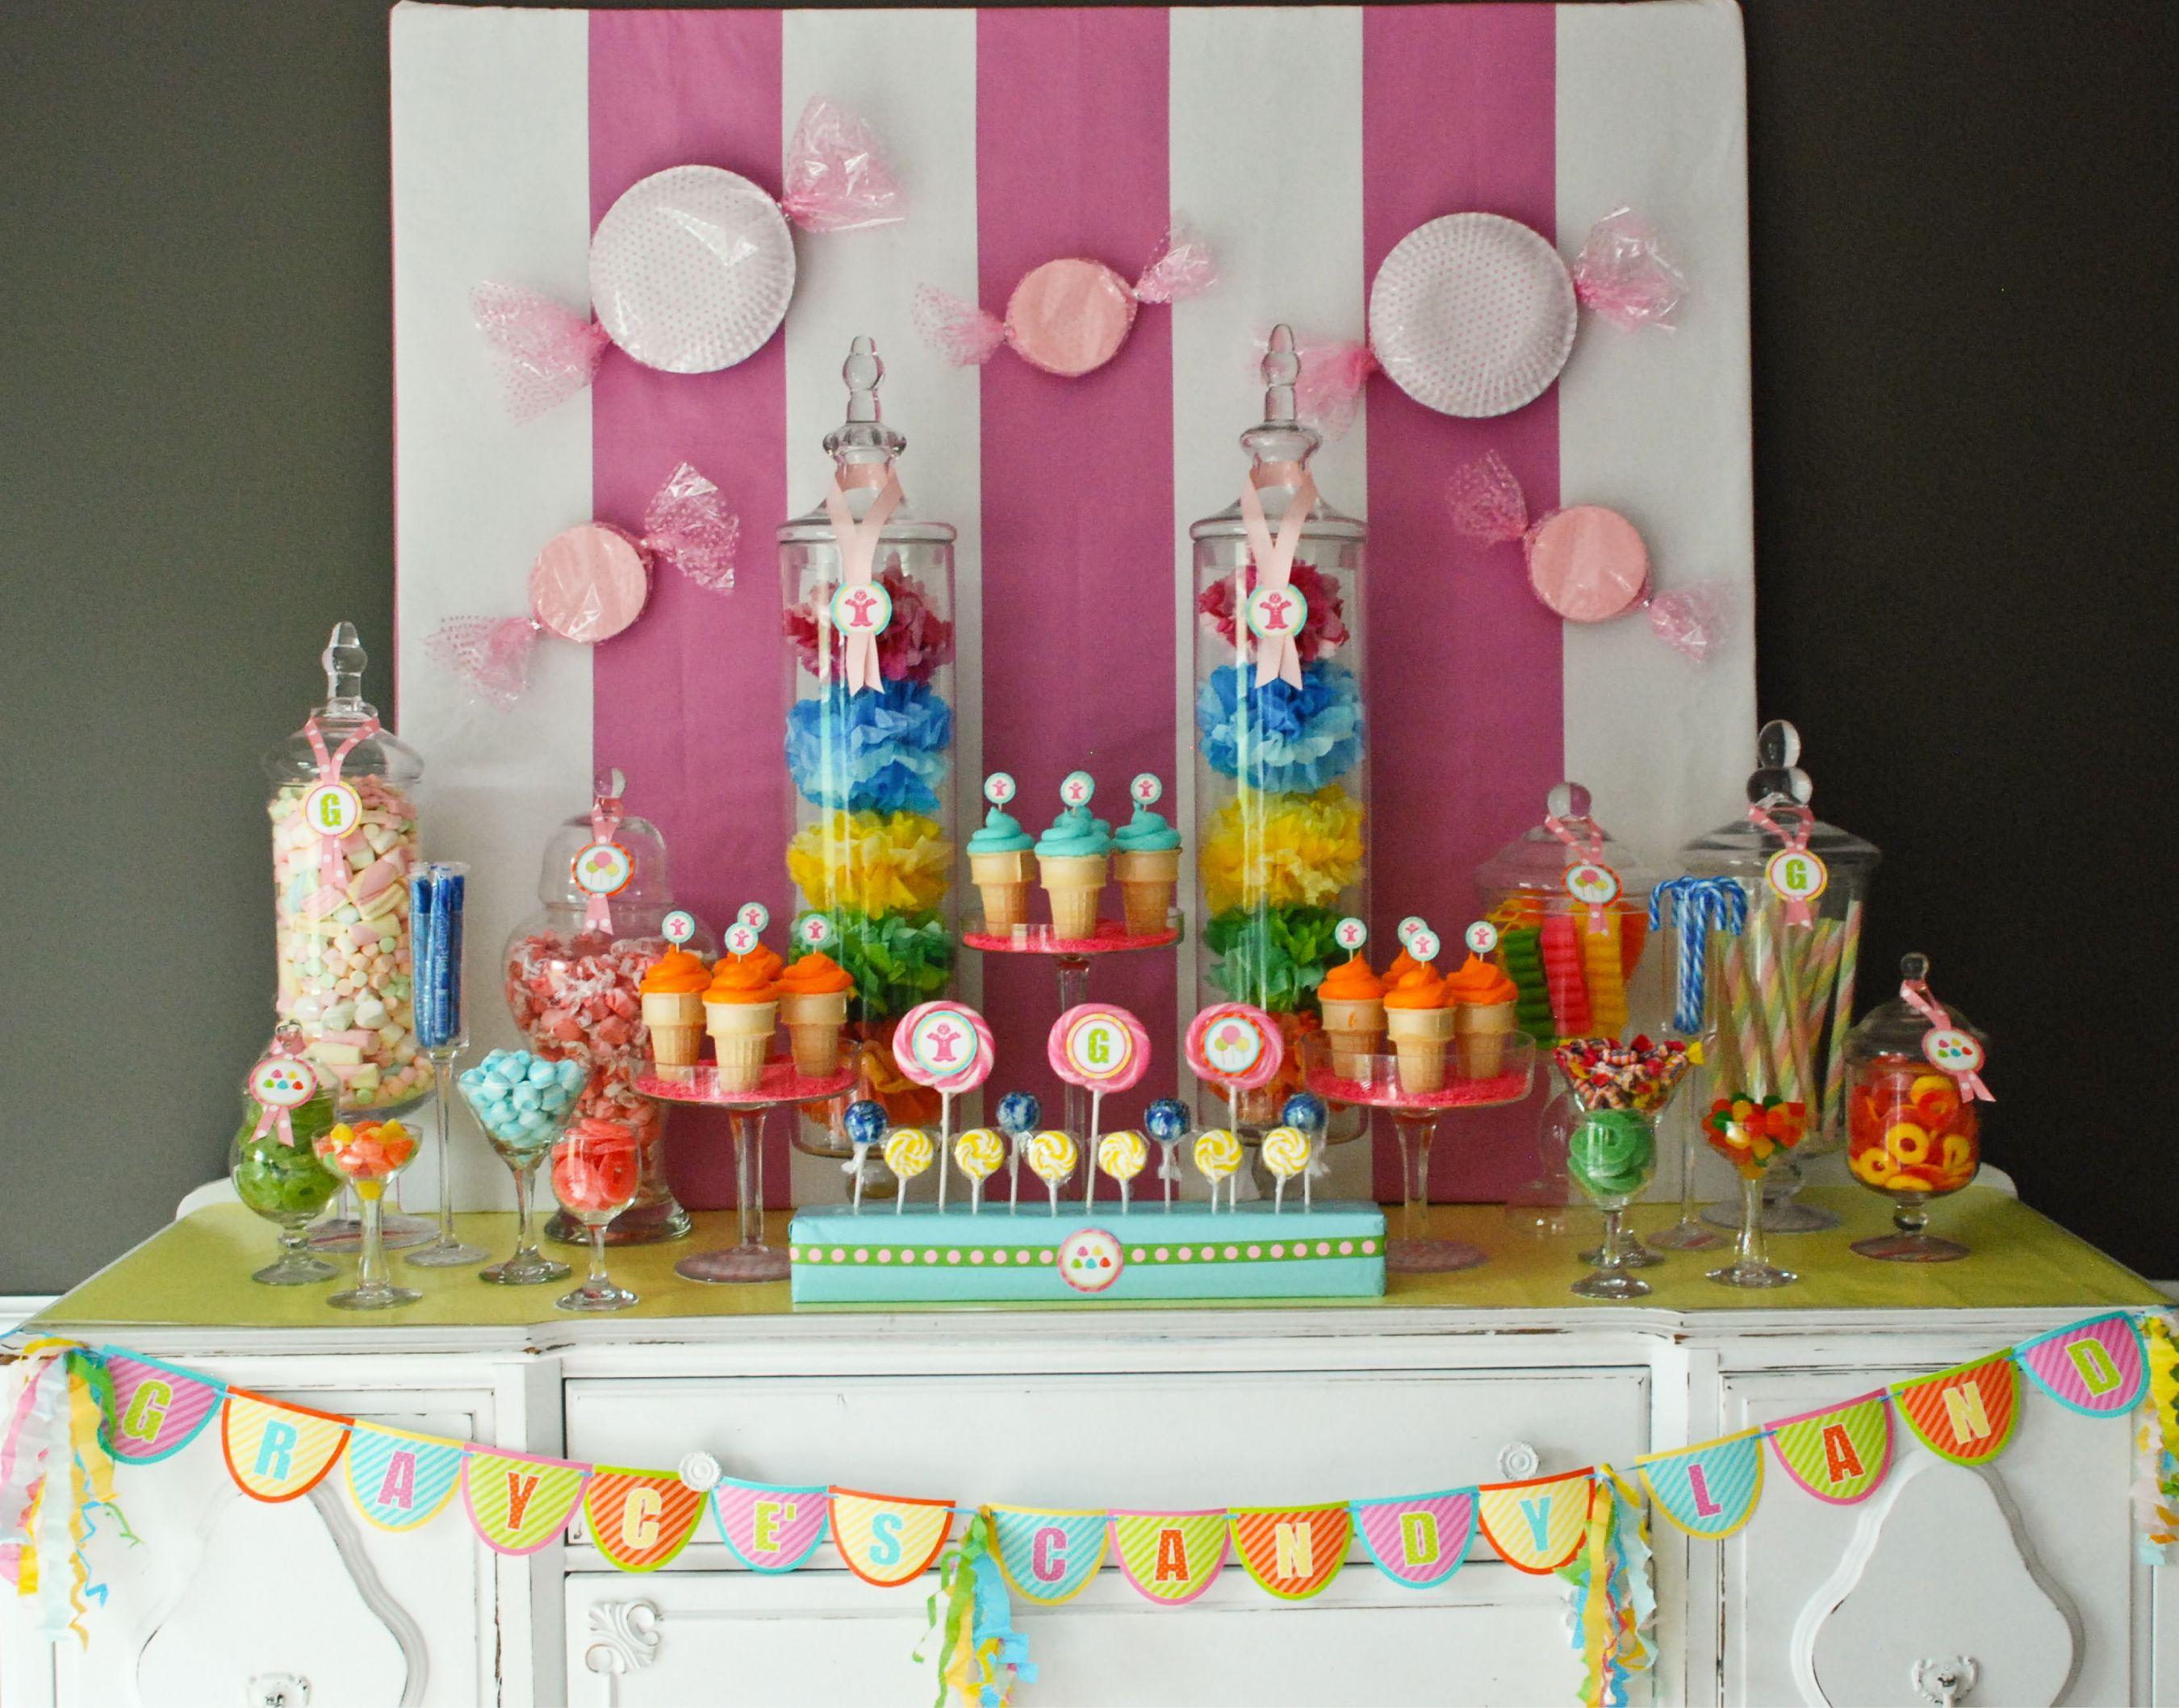 Candyland Birthday Table Setup | Cool Ideas | Pinterest | Candyland ...